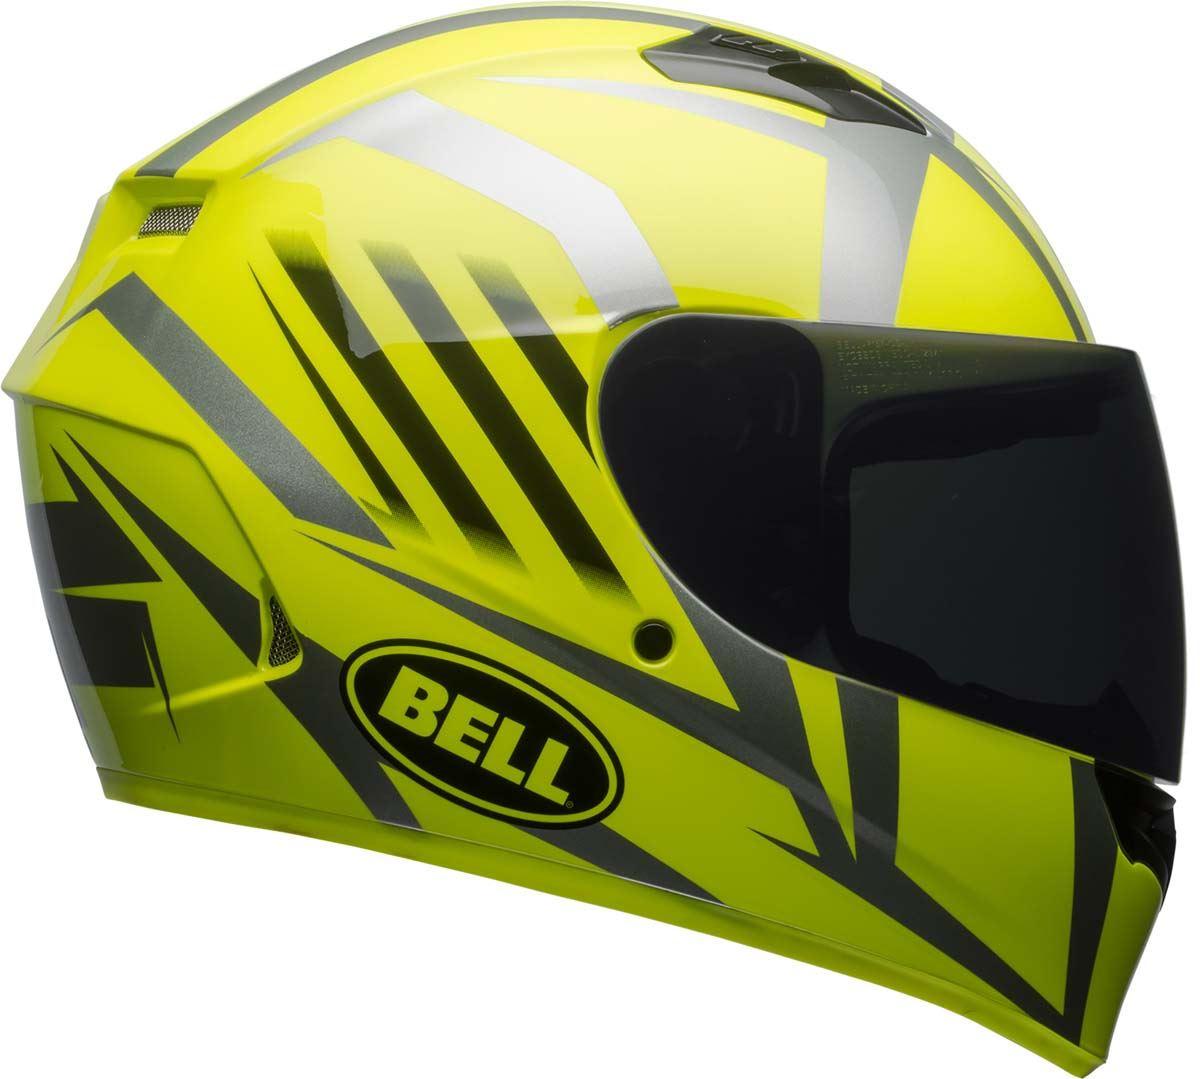 Bell-Qualifier-Helmet-Full-Face-Motorcycle-Clear-Shield-DOT-XS-3XL miniature 40